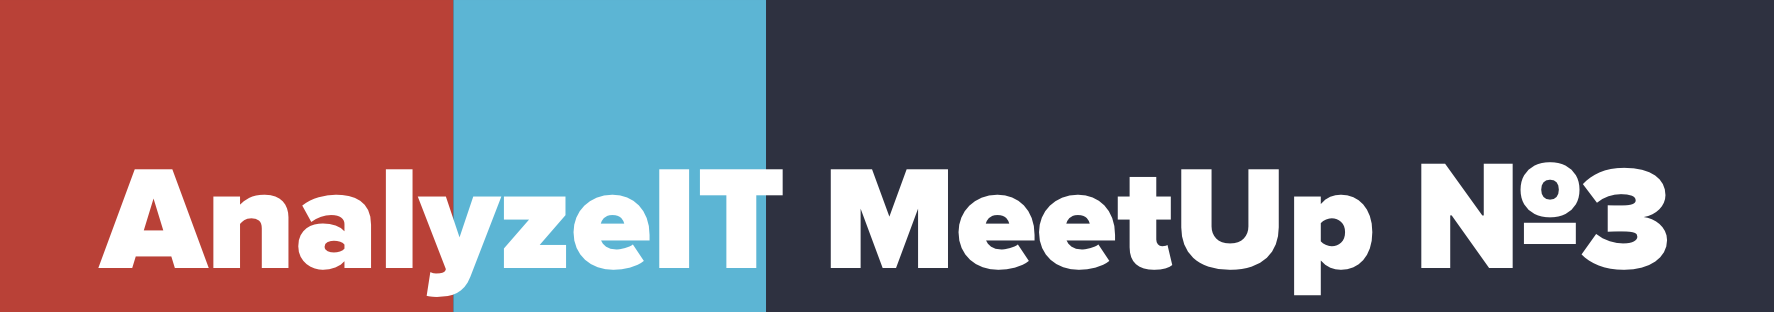 22 ноября, Москва — AnalyzeIT MeetUp №3 - 1